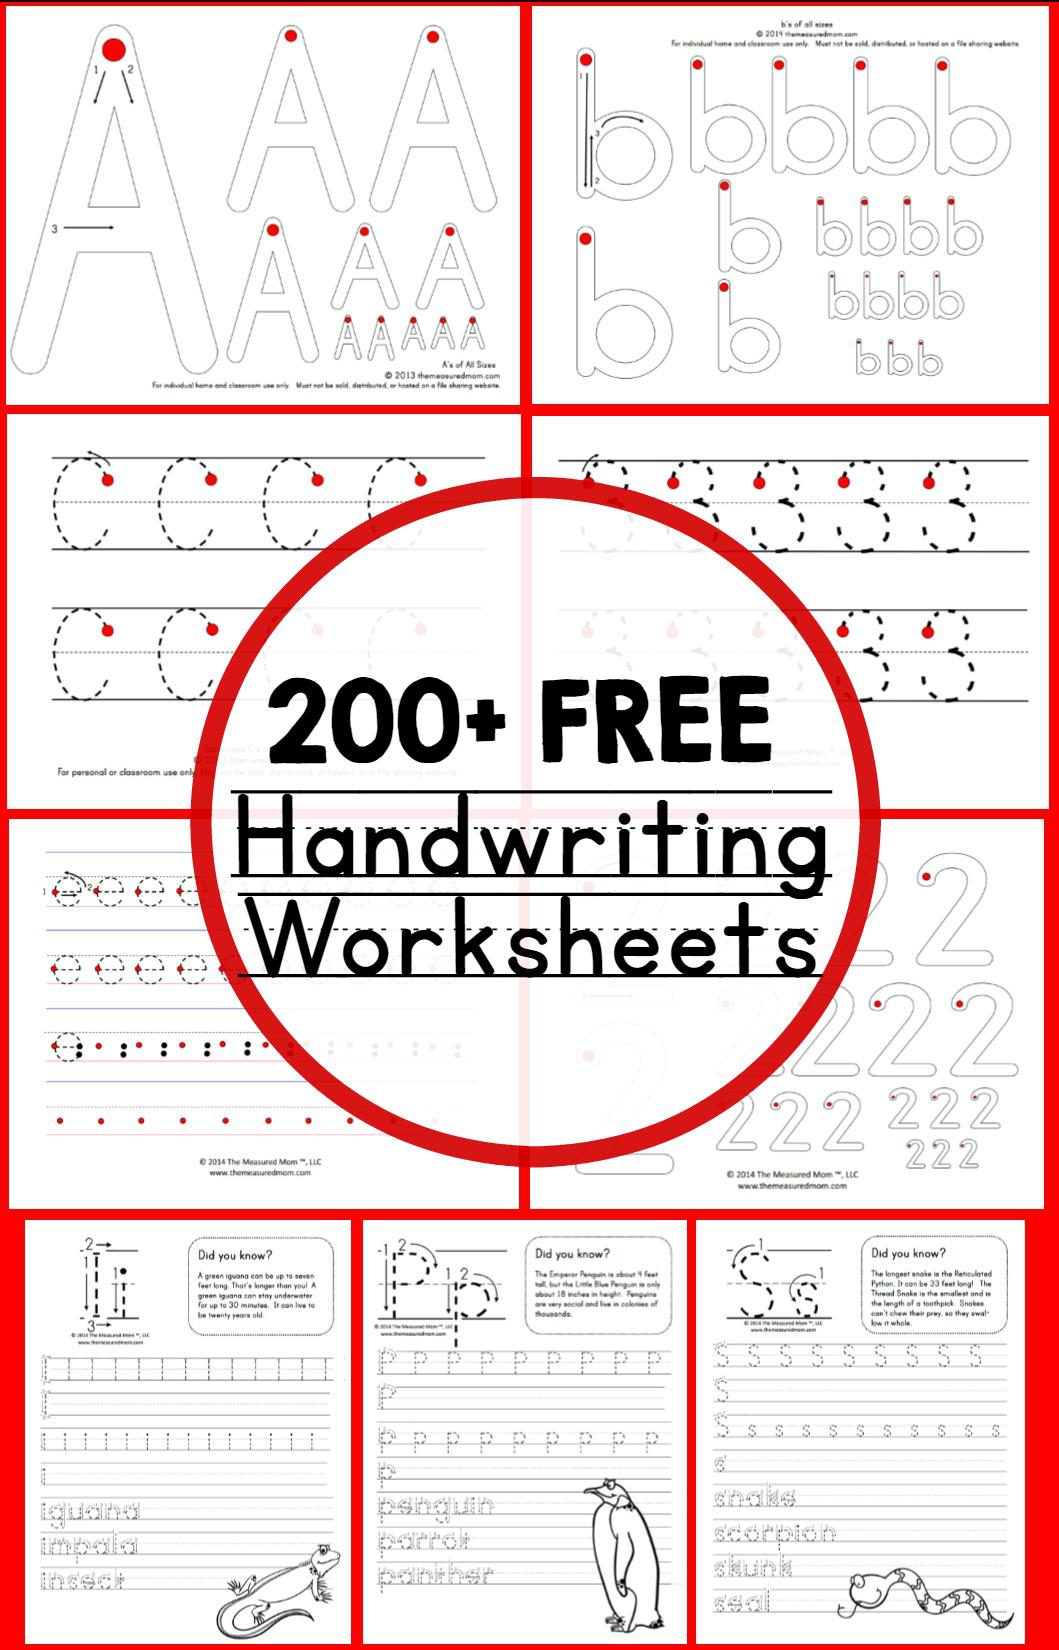 Worksheets Free Abc Worksheets For Pre-k teaching handwriting writing in kindergarten pinterest 200 free worksheets more preschool worksheets